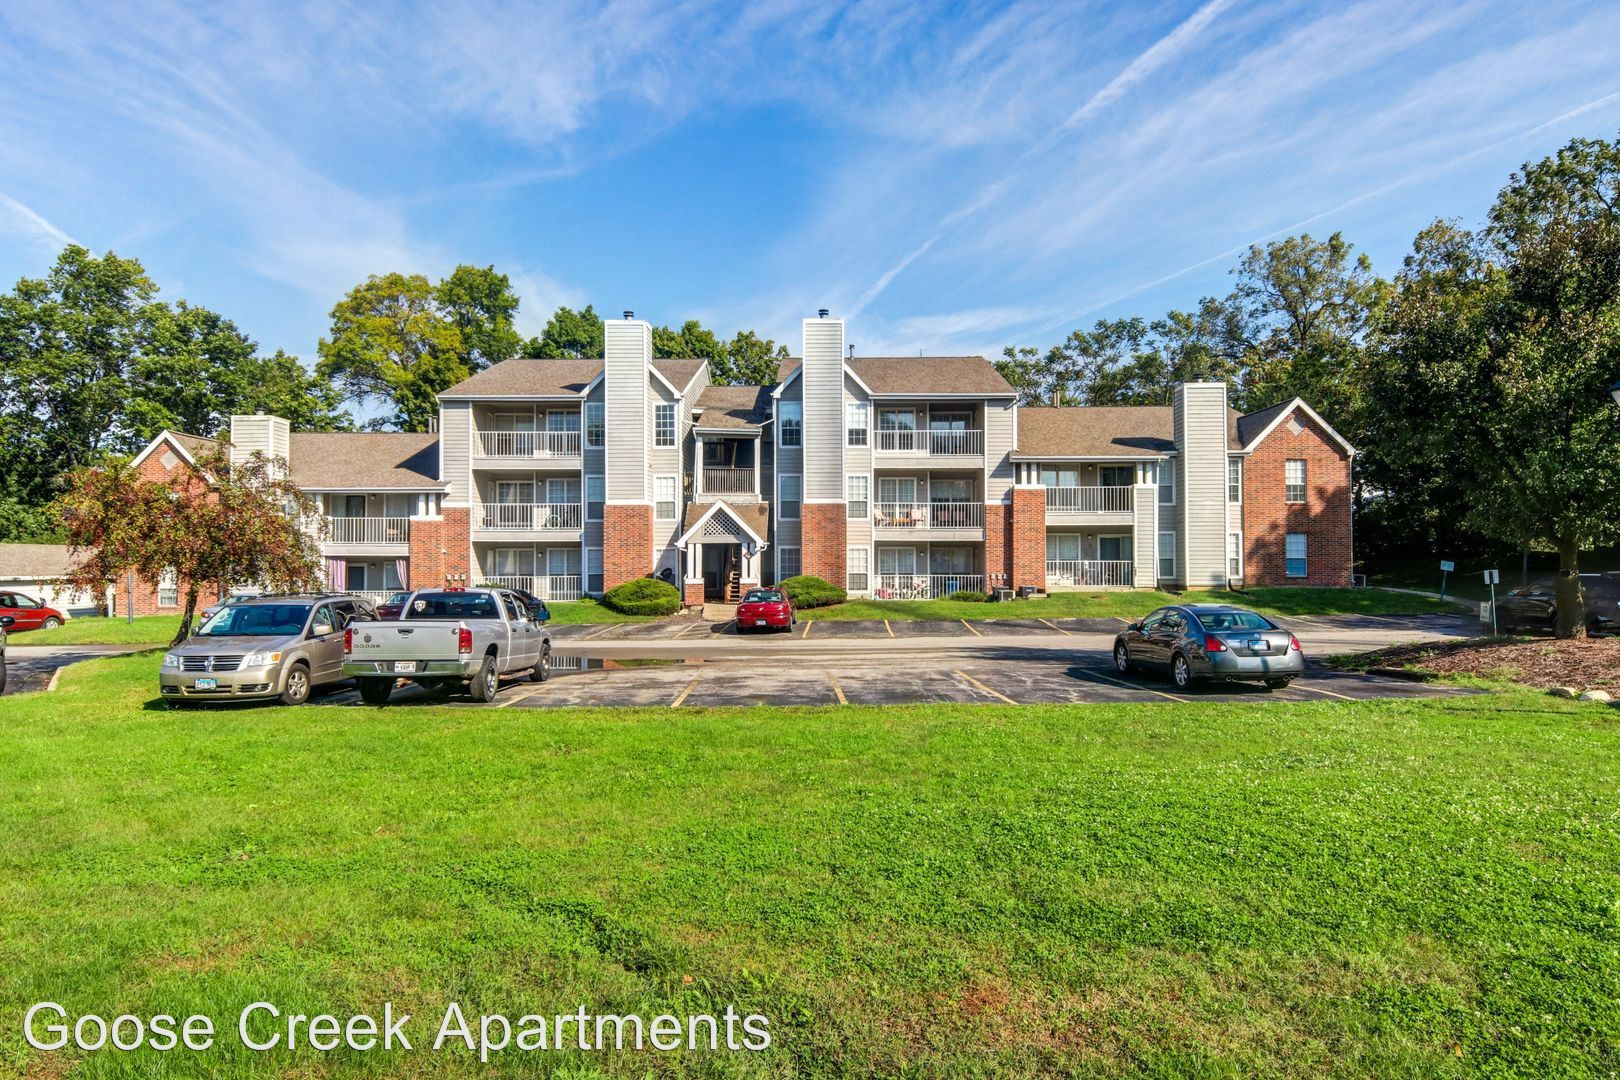 Apartments Near Illinois Wesleyan 2 Goose Creek Drive for Illinois Wesleyan University Students in Bloomington, IL